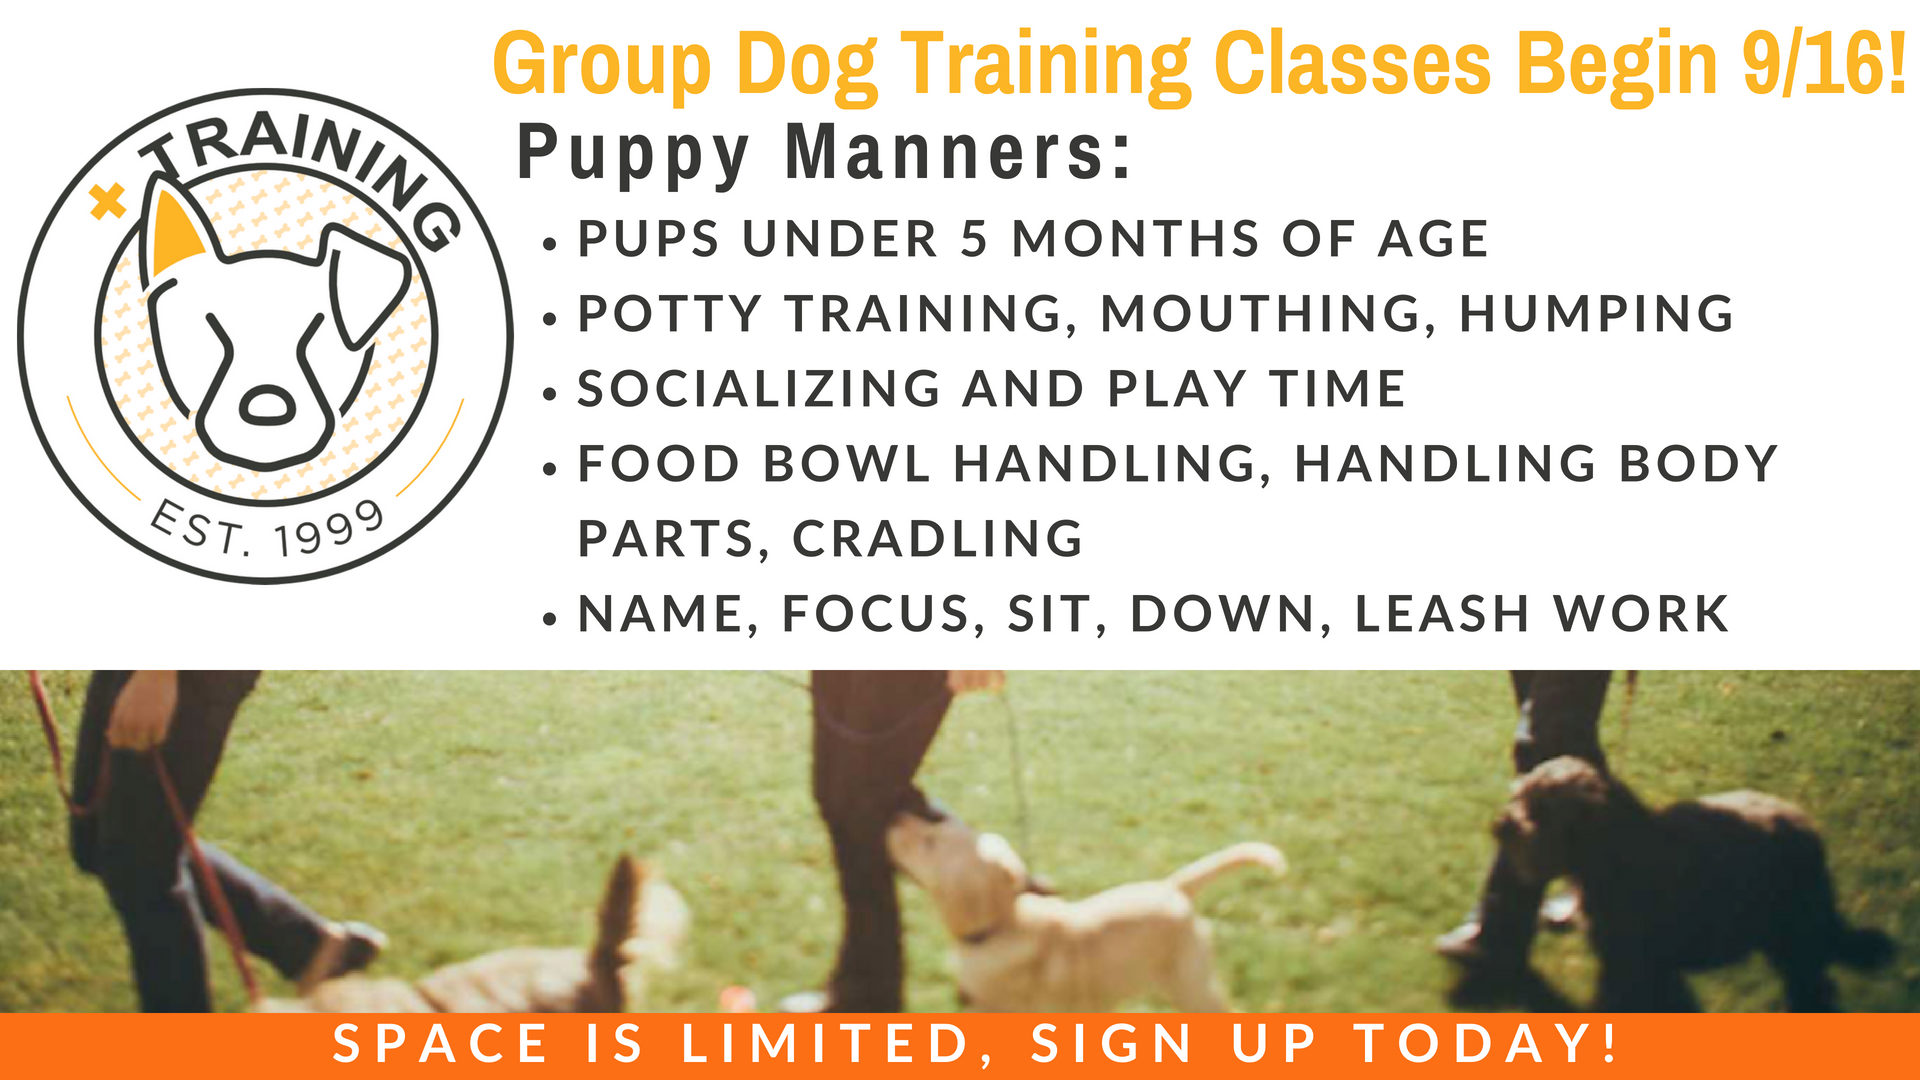 Dog Training - Puppy Manners.jpg